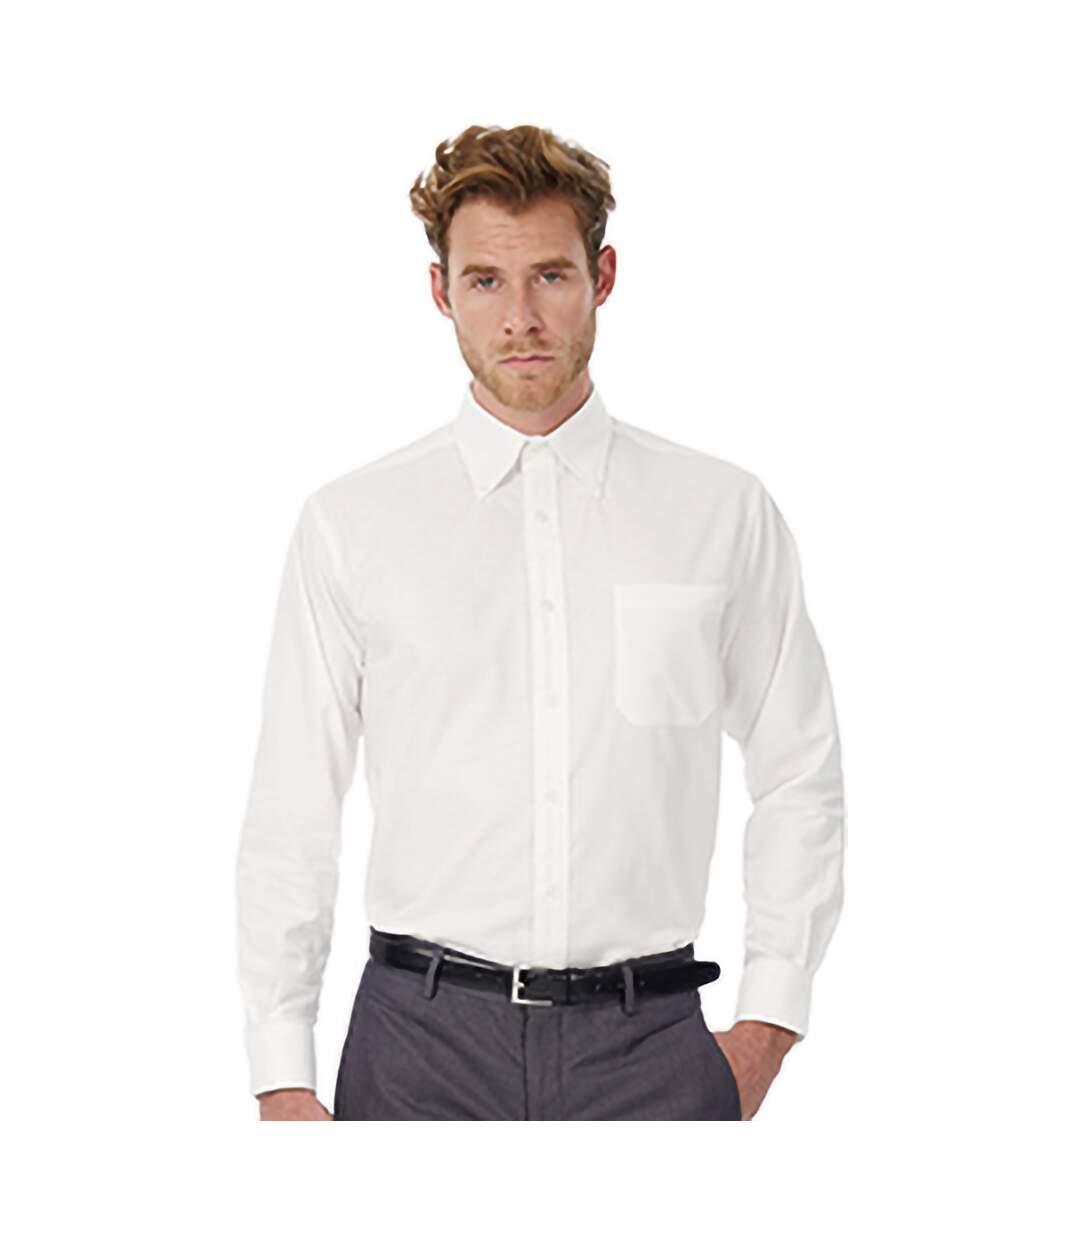 B&C Mens Oxford Long Sleeve Shirt / Mens Shirts (White) - UTBC105